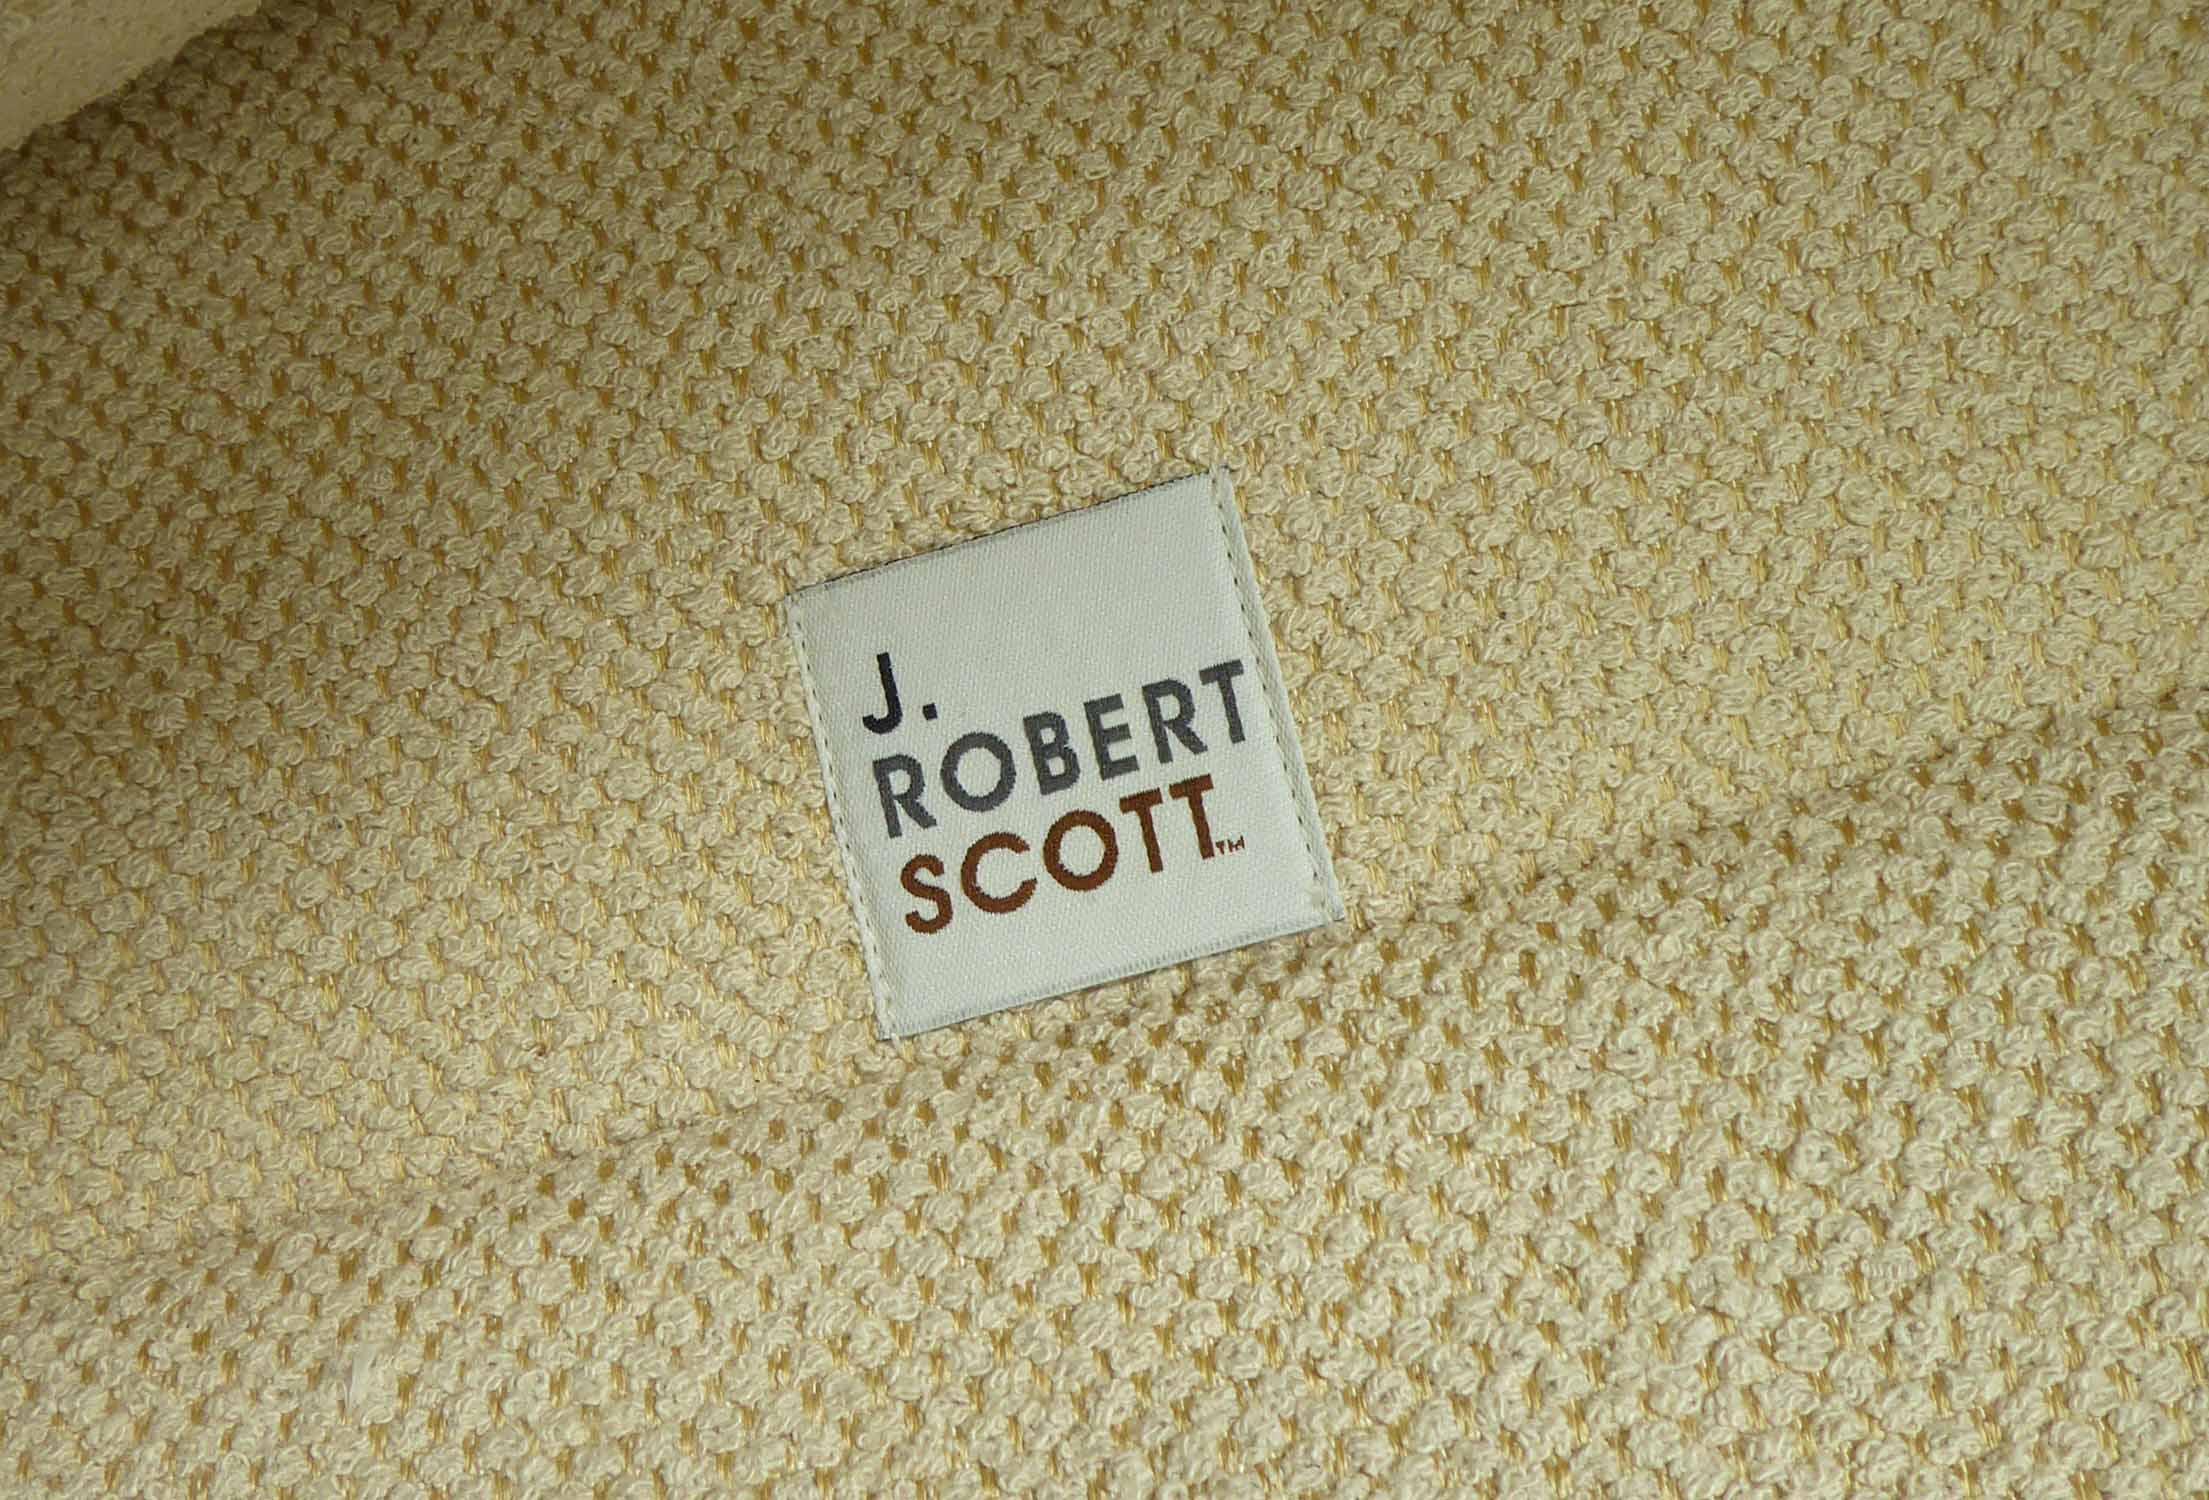 Lot 30 - J ROBERT SCOTT VICE VERSA LOUNGE CHAIRS, a pair, by Sally Sirkin Lewis, 87cm x 87cm x 78cm.